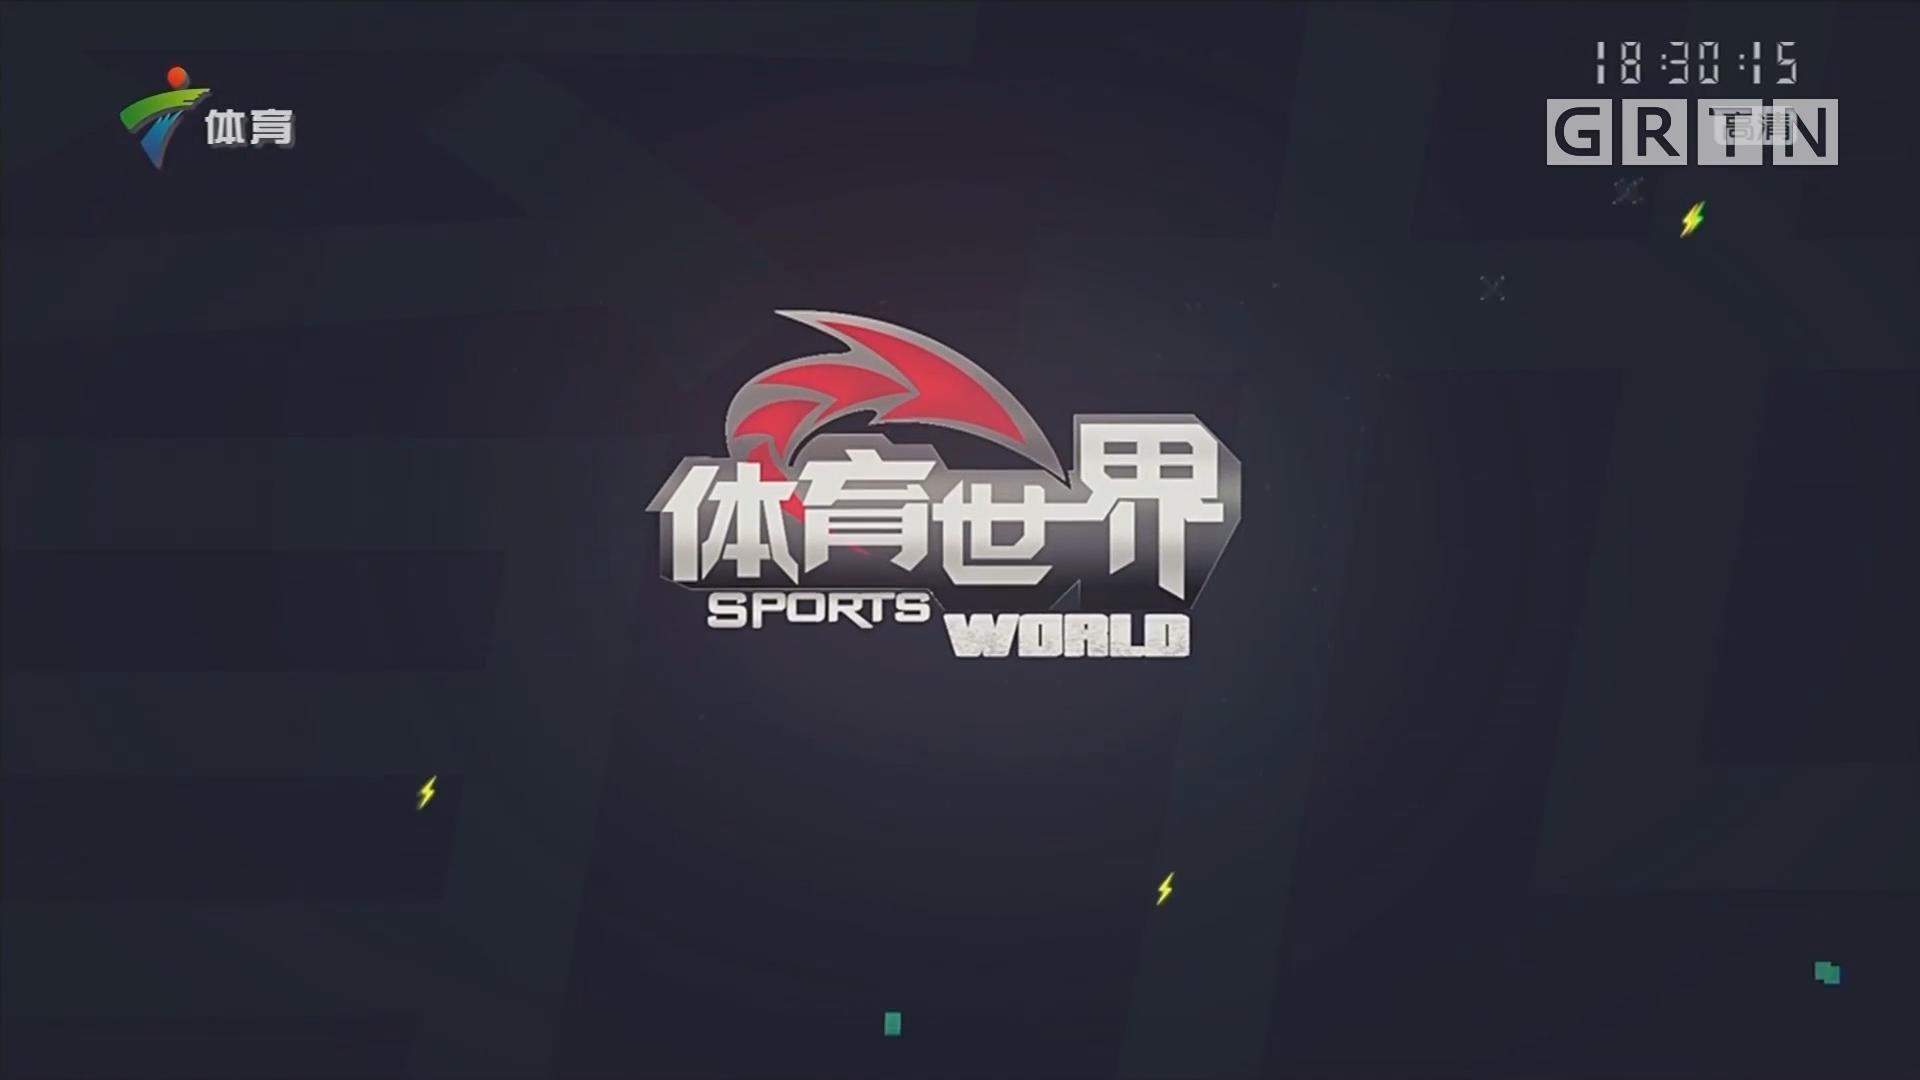 [HD][2019-04-08]体育世界:CBA半决赛今晚上演 广东、深圳各有优势